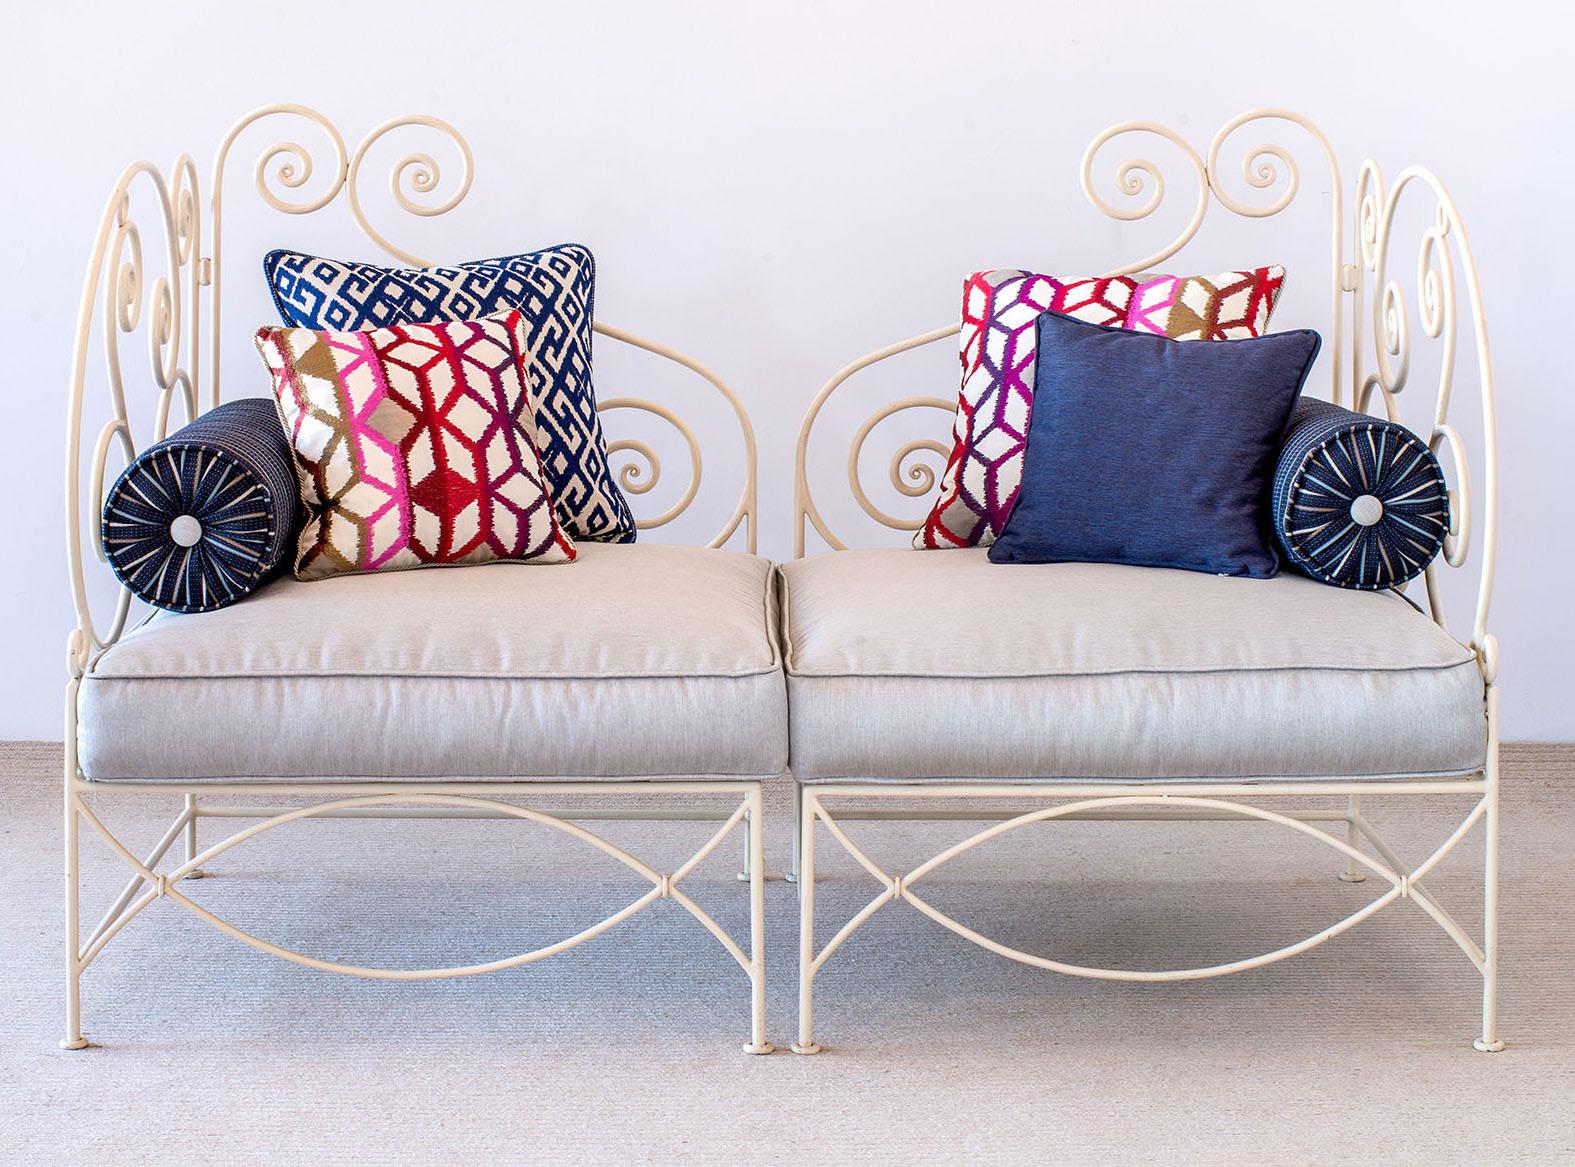 sillon-forja-muebles-exterior-artesania-marbella